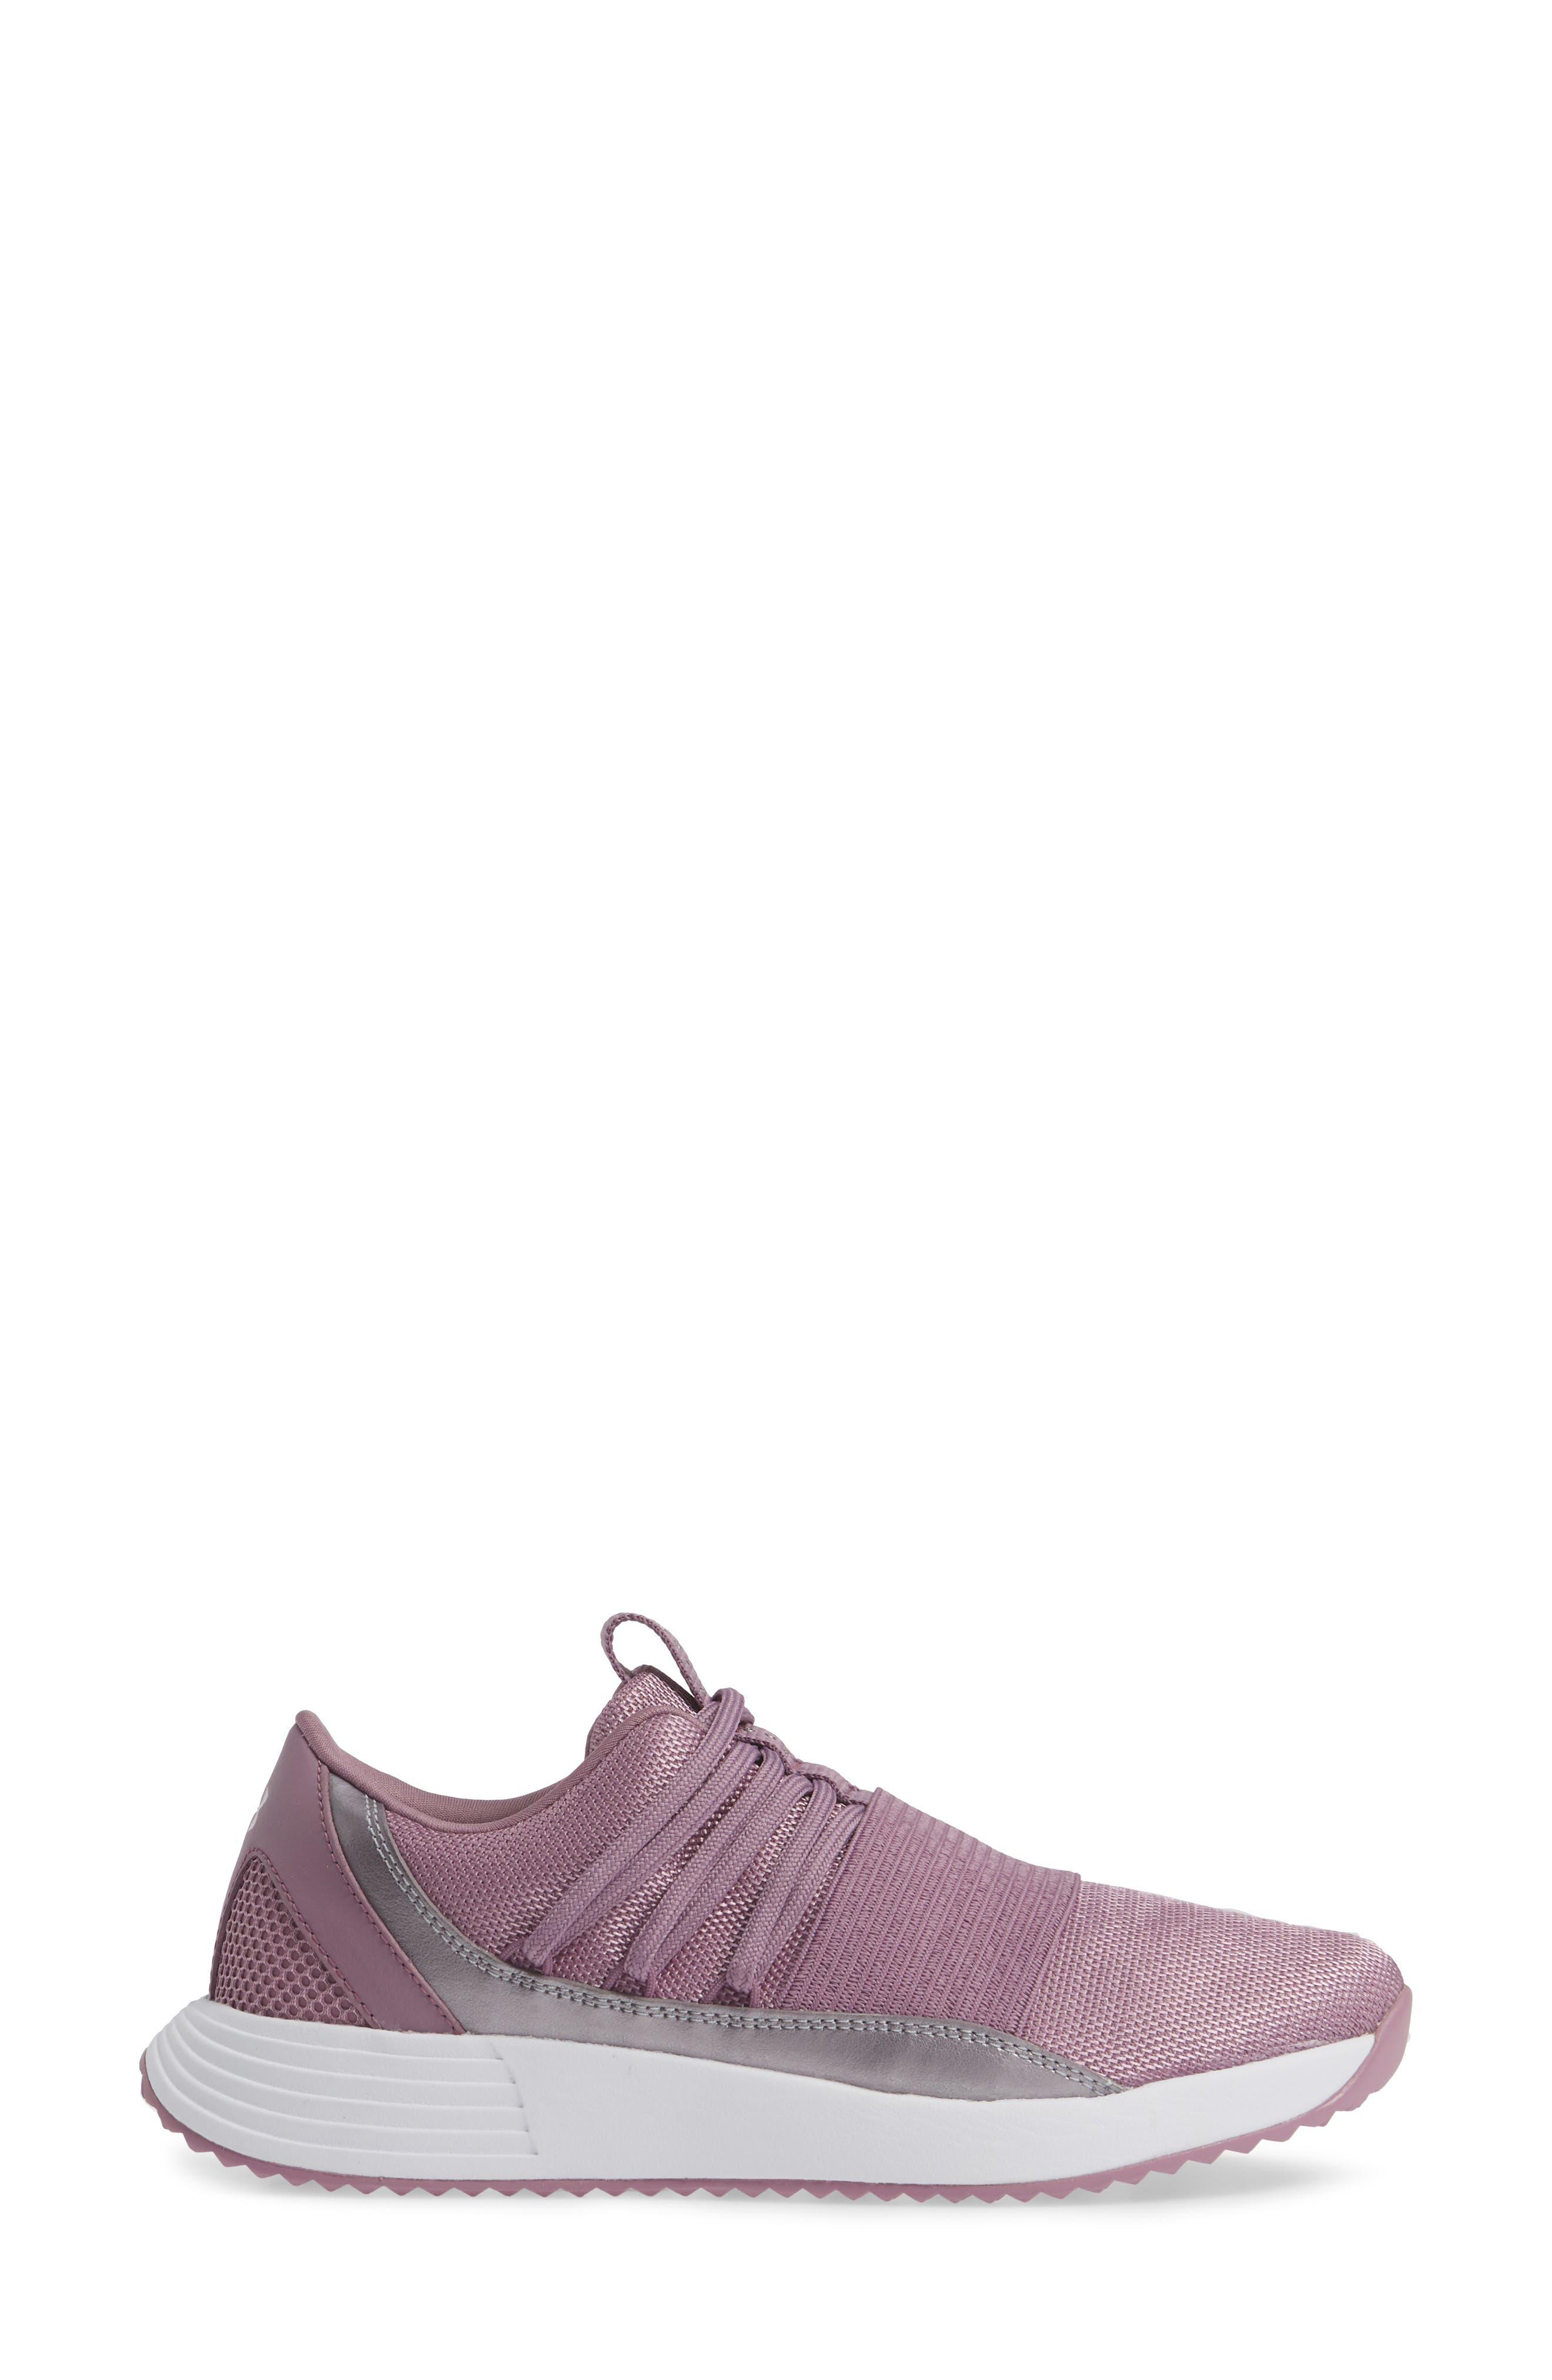 Breathe Lace X NM Sneaker,                             Alternate thumbnail 3, color,                             PURPLE PRIME/ WHITE/ WHITE